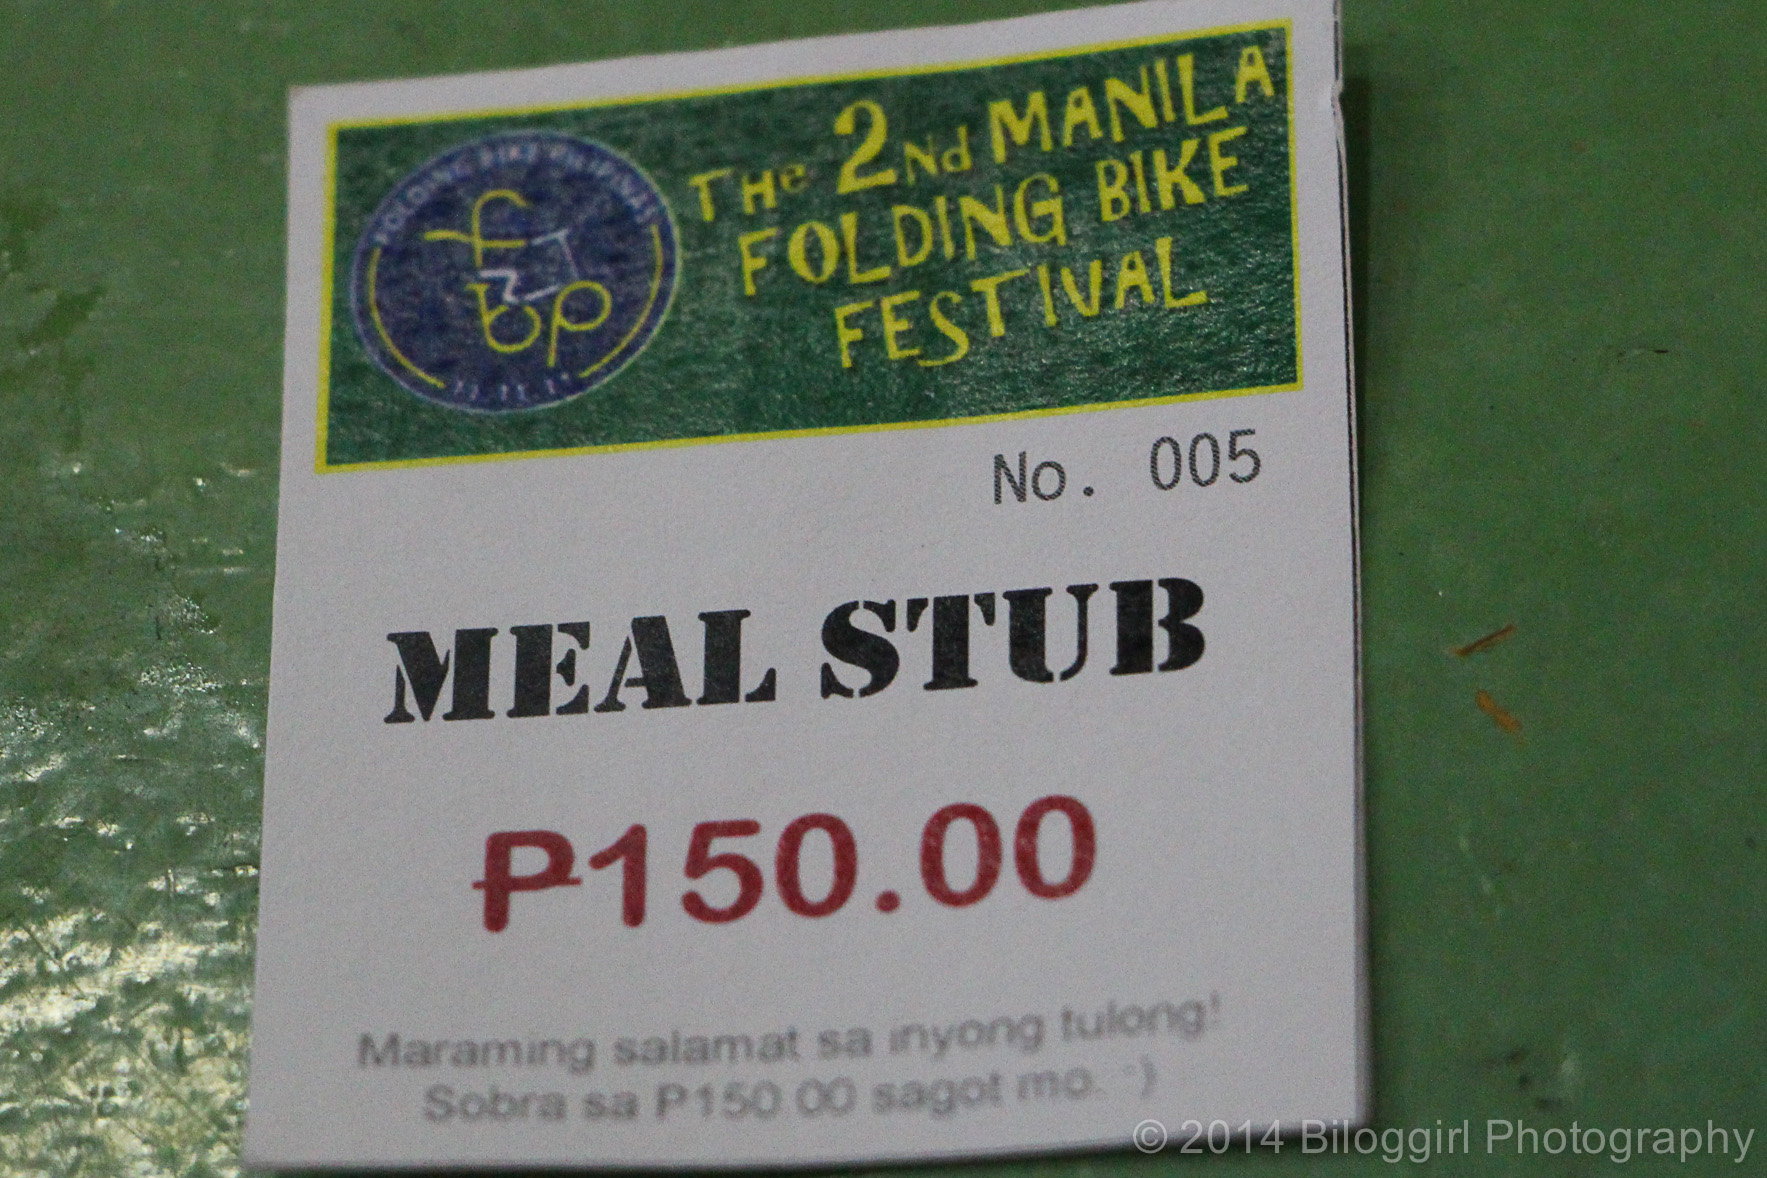 2nd Manila Folding Bike Festival-105